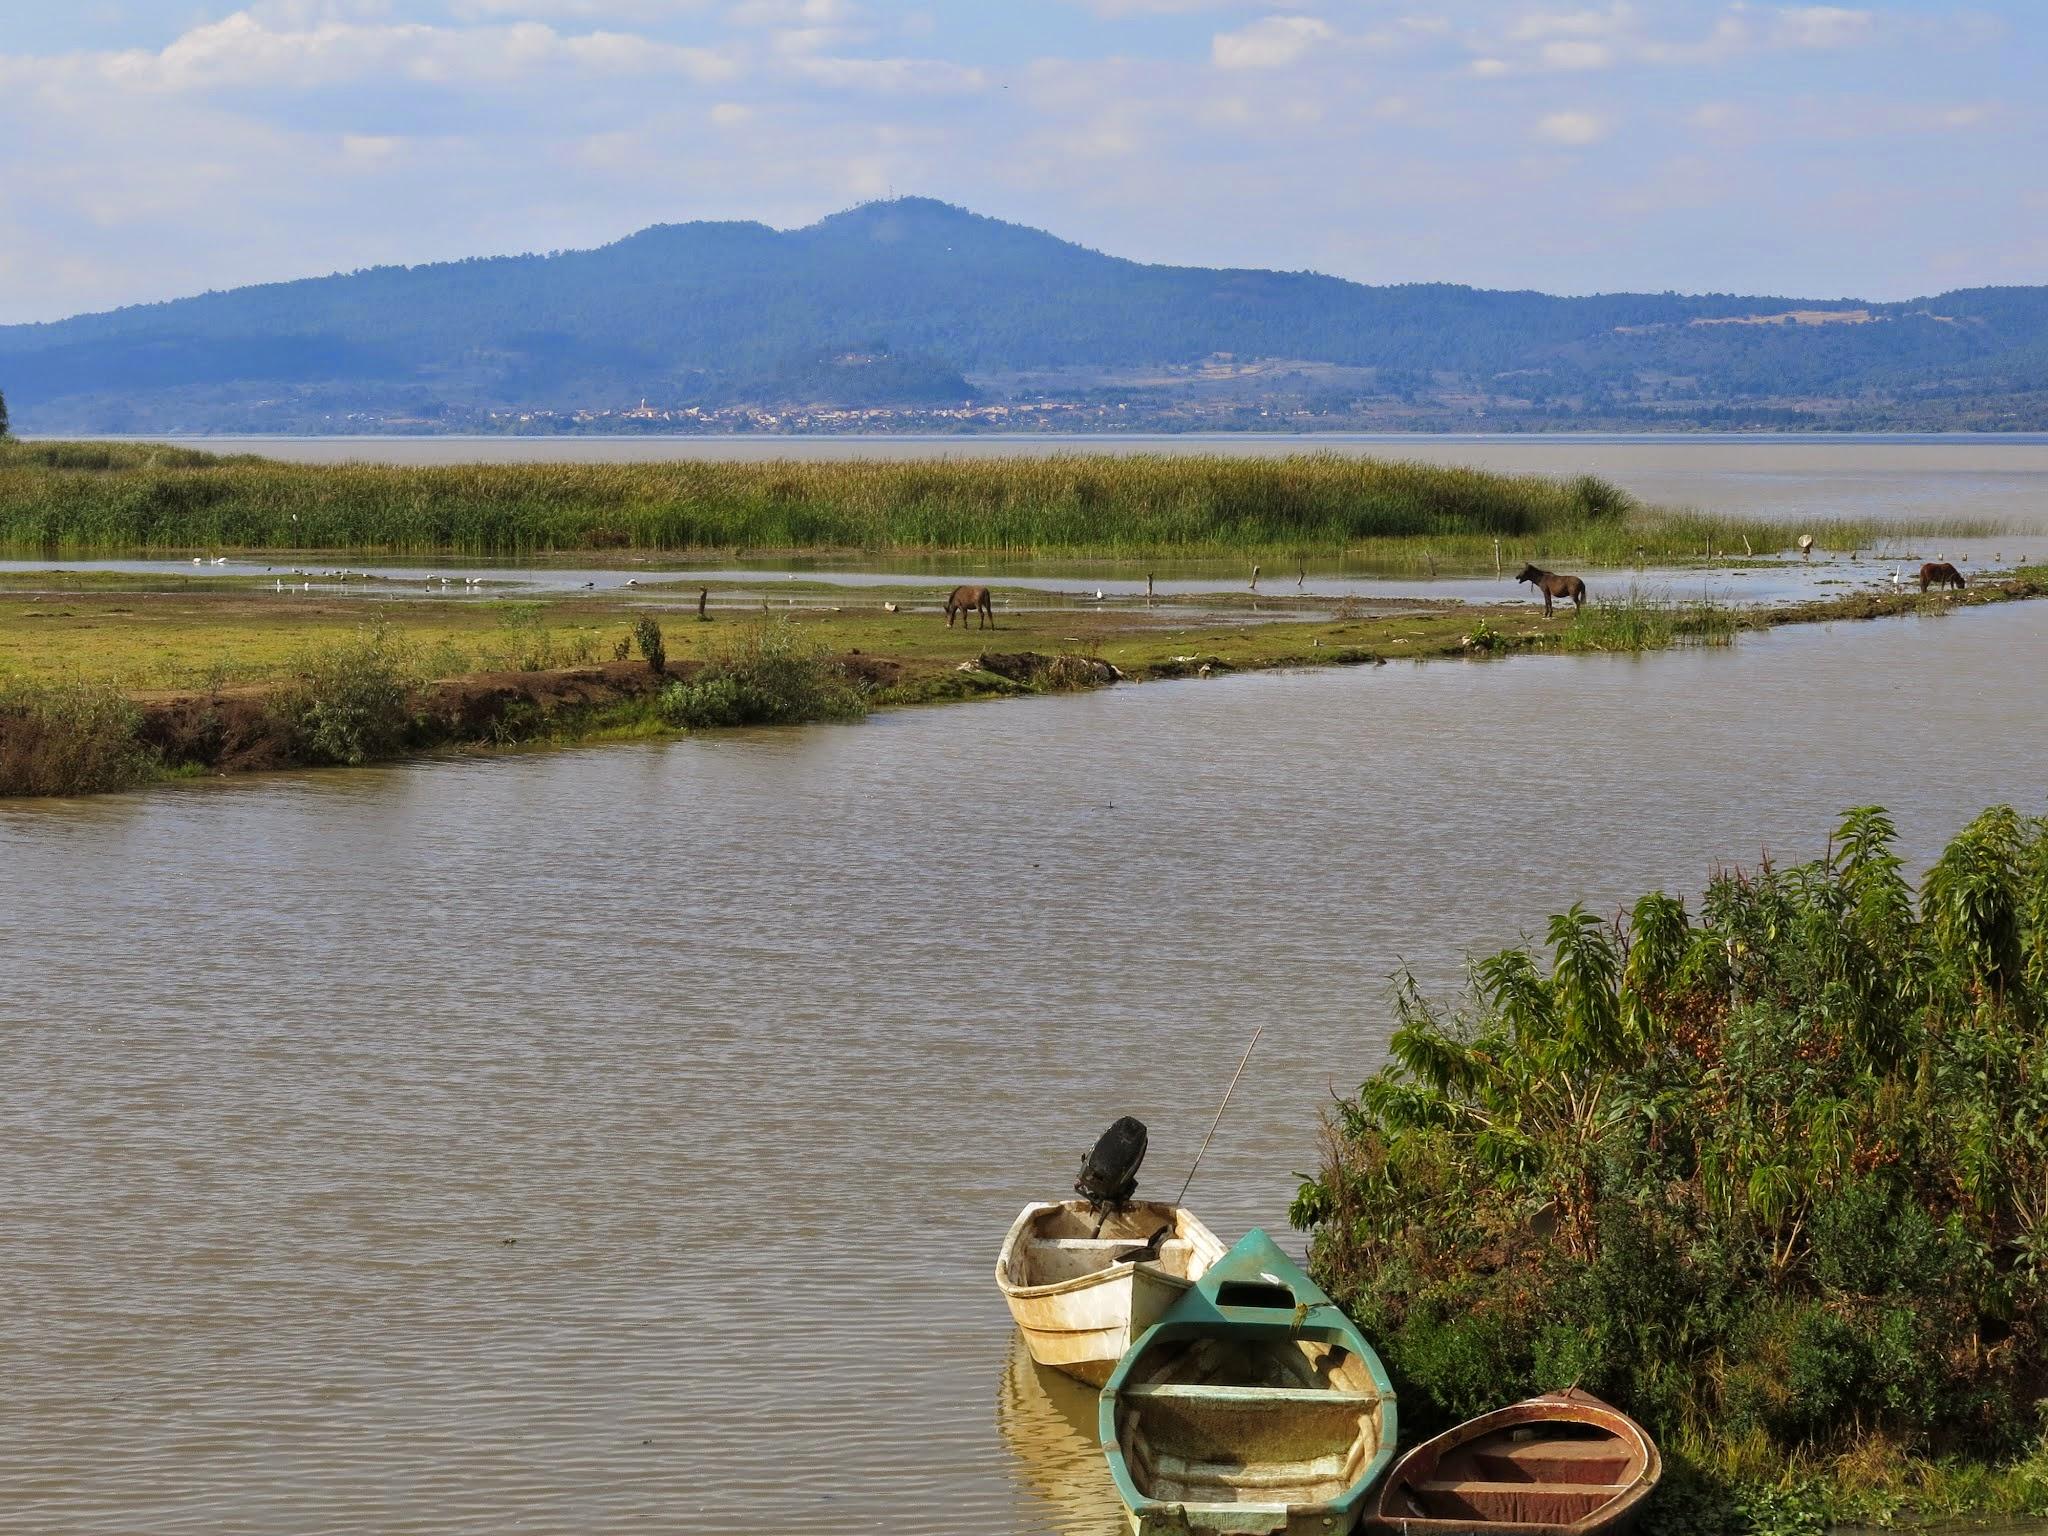 A leisurely drive around lake patzcuaro awol americans for Fishing lakes around me